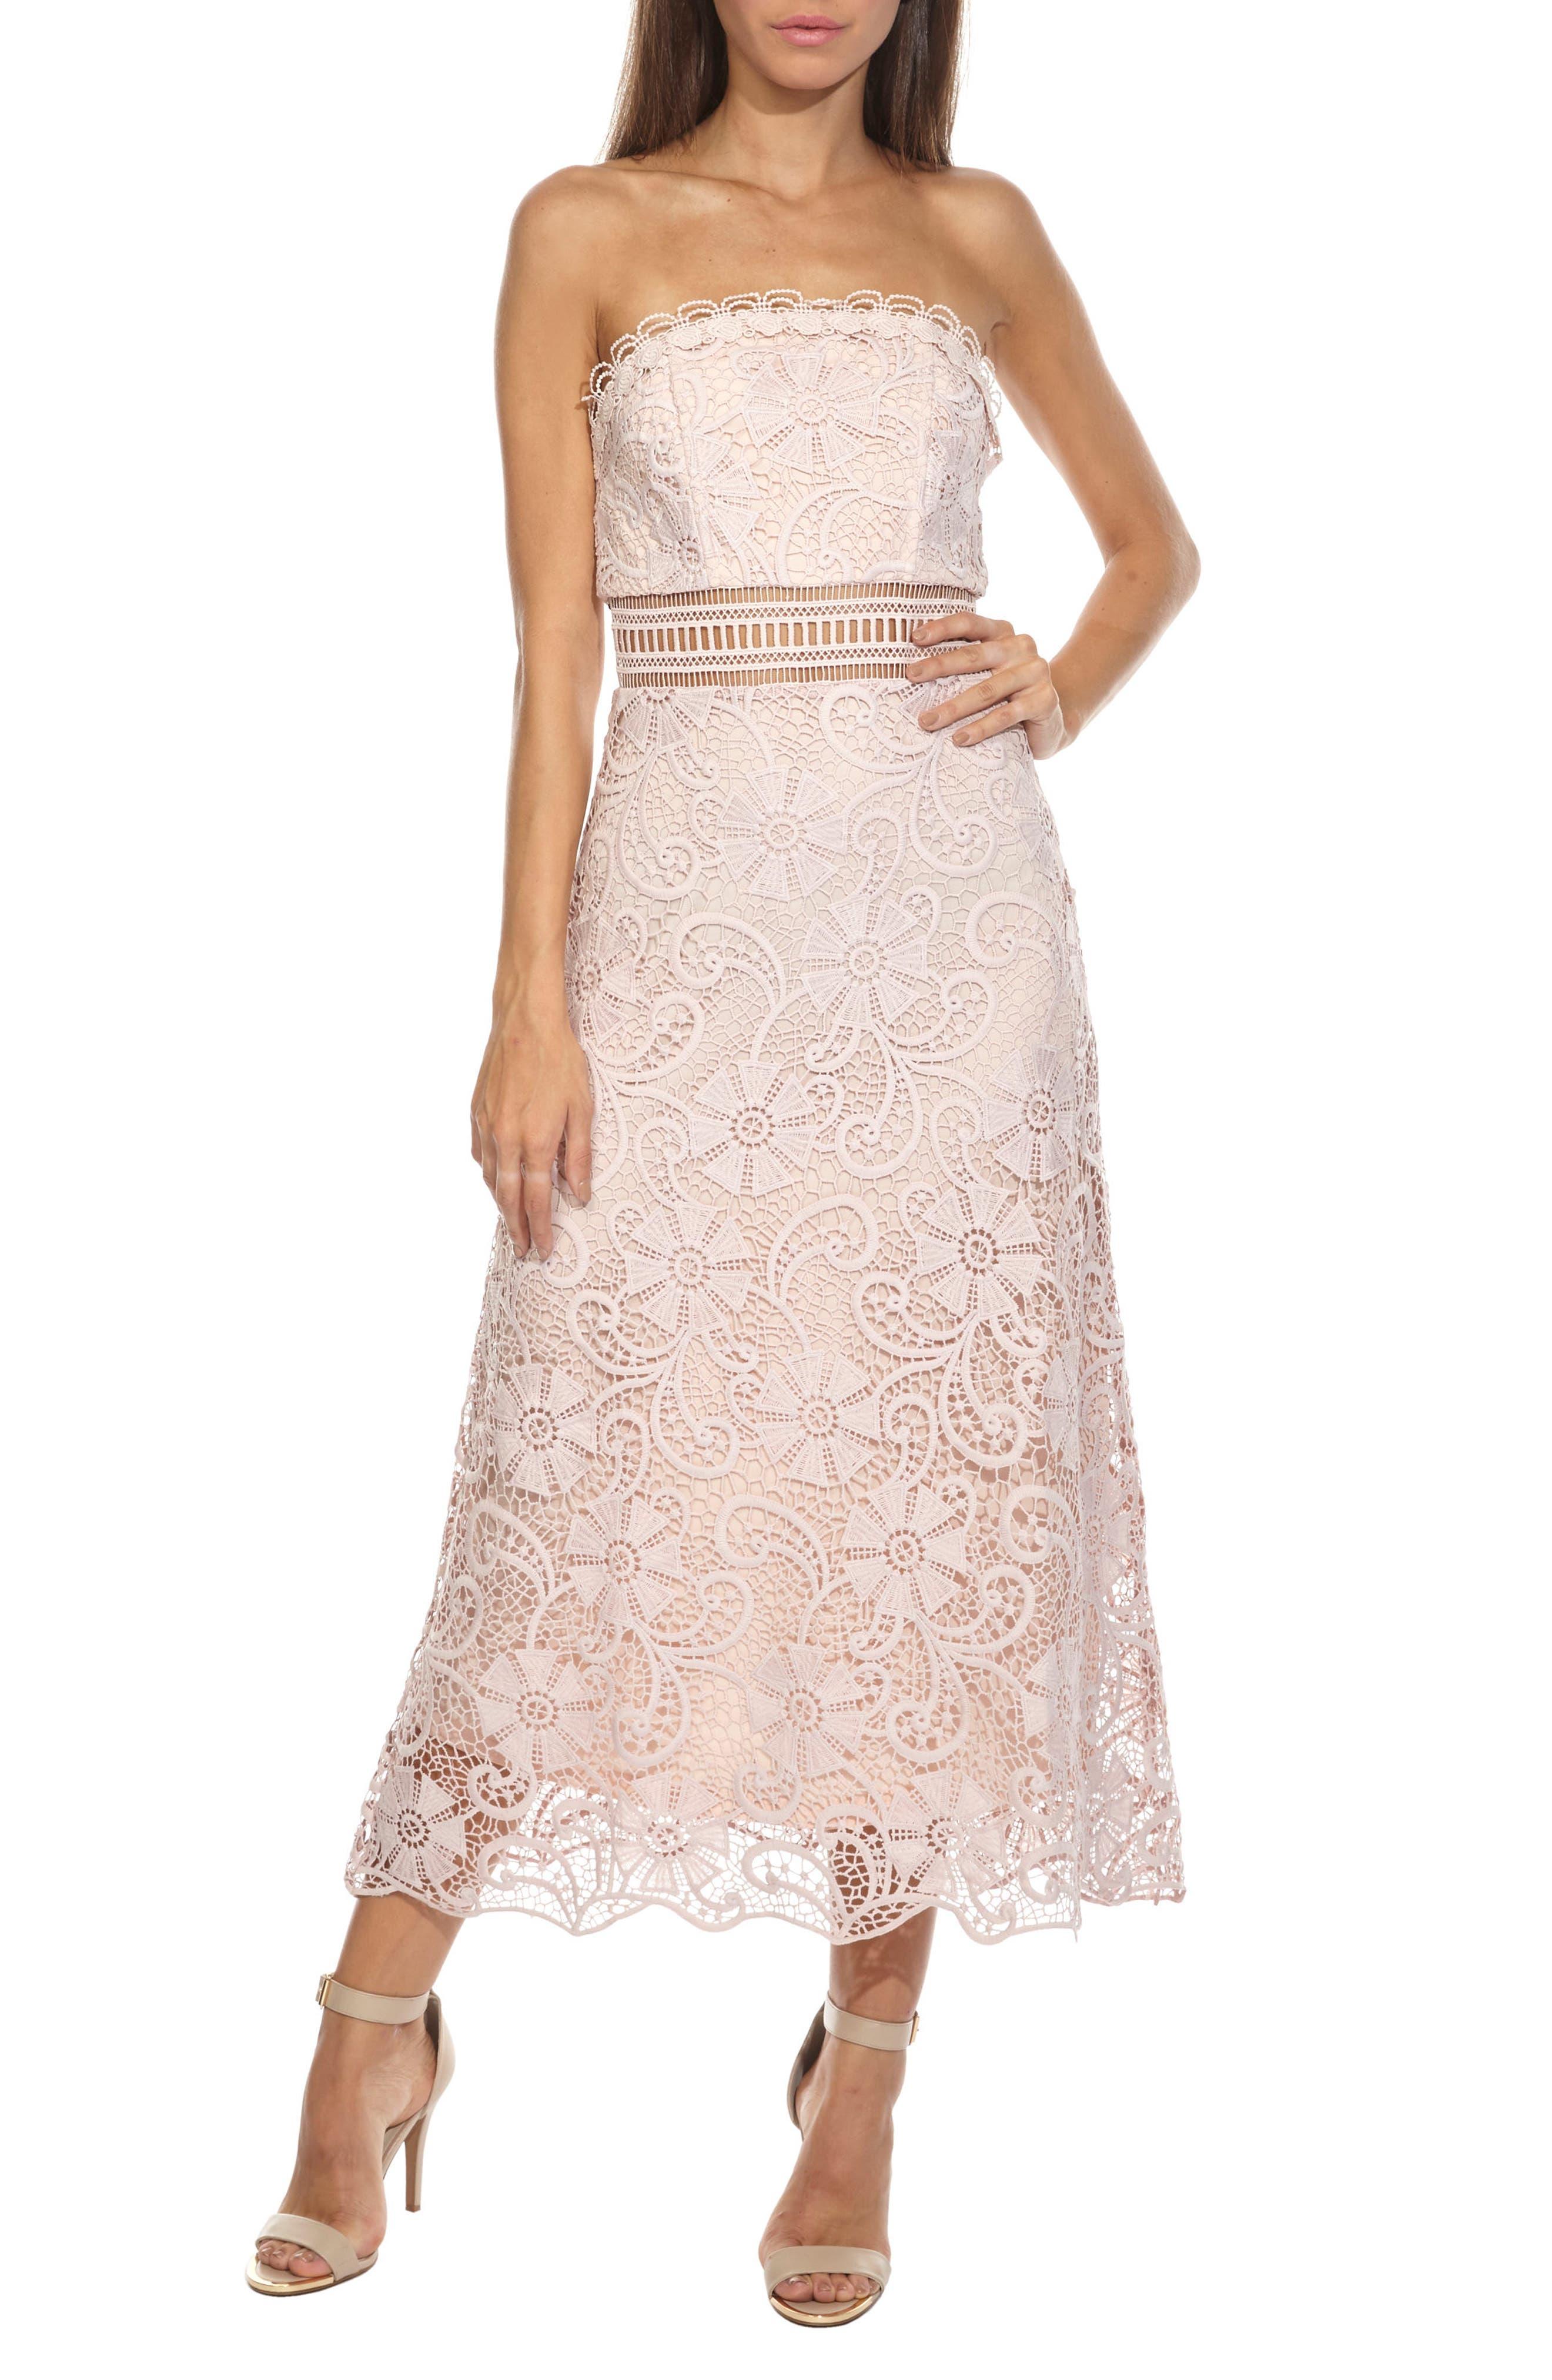 Yani Lace Strapless Midi Dress,                         Main,                         color, PINK